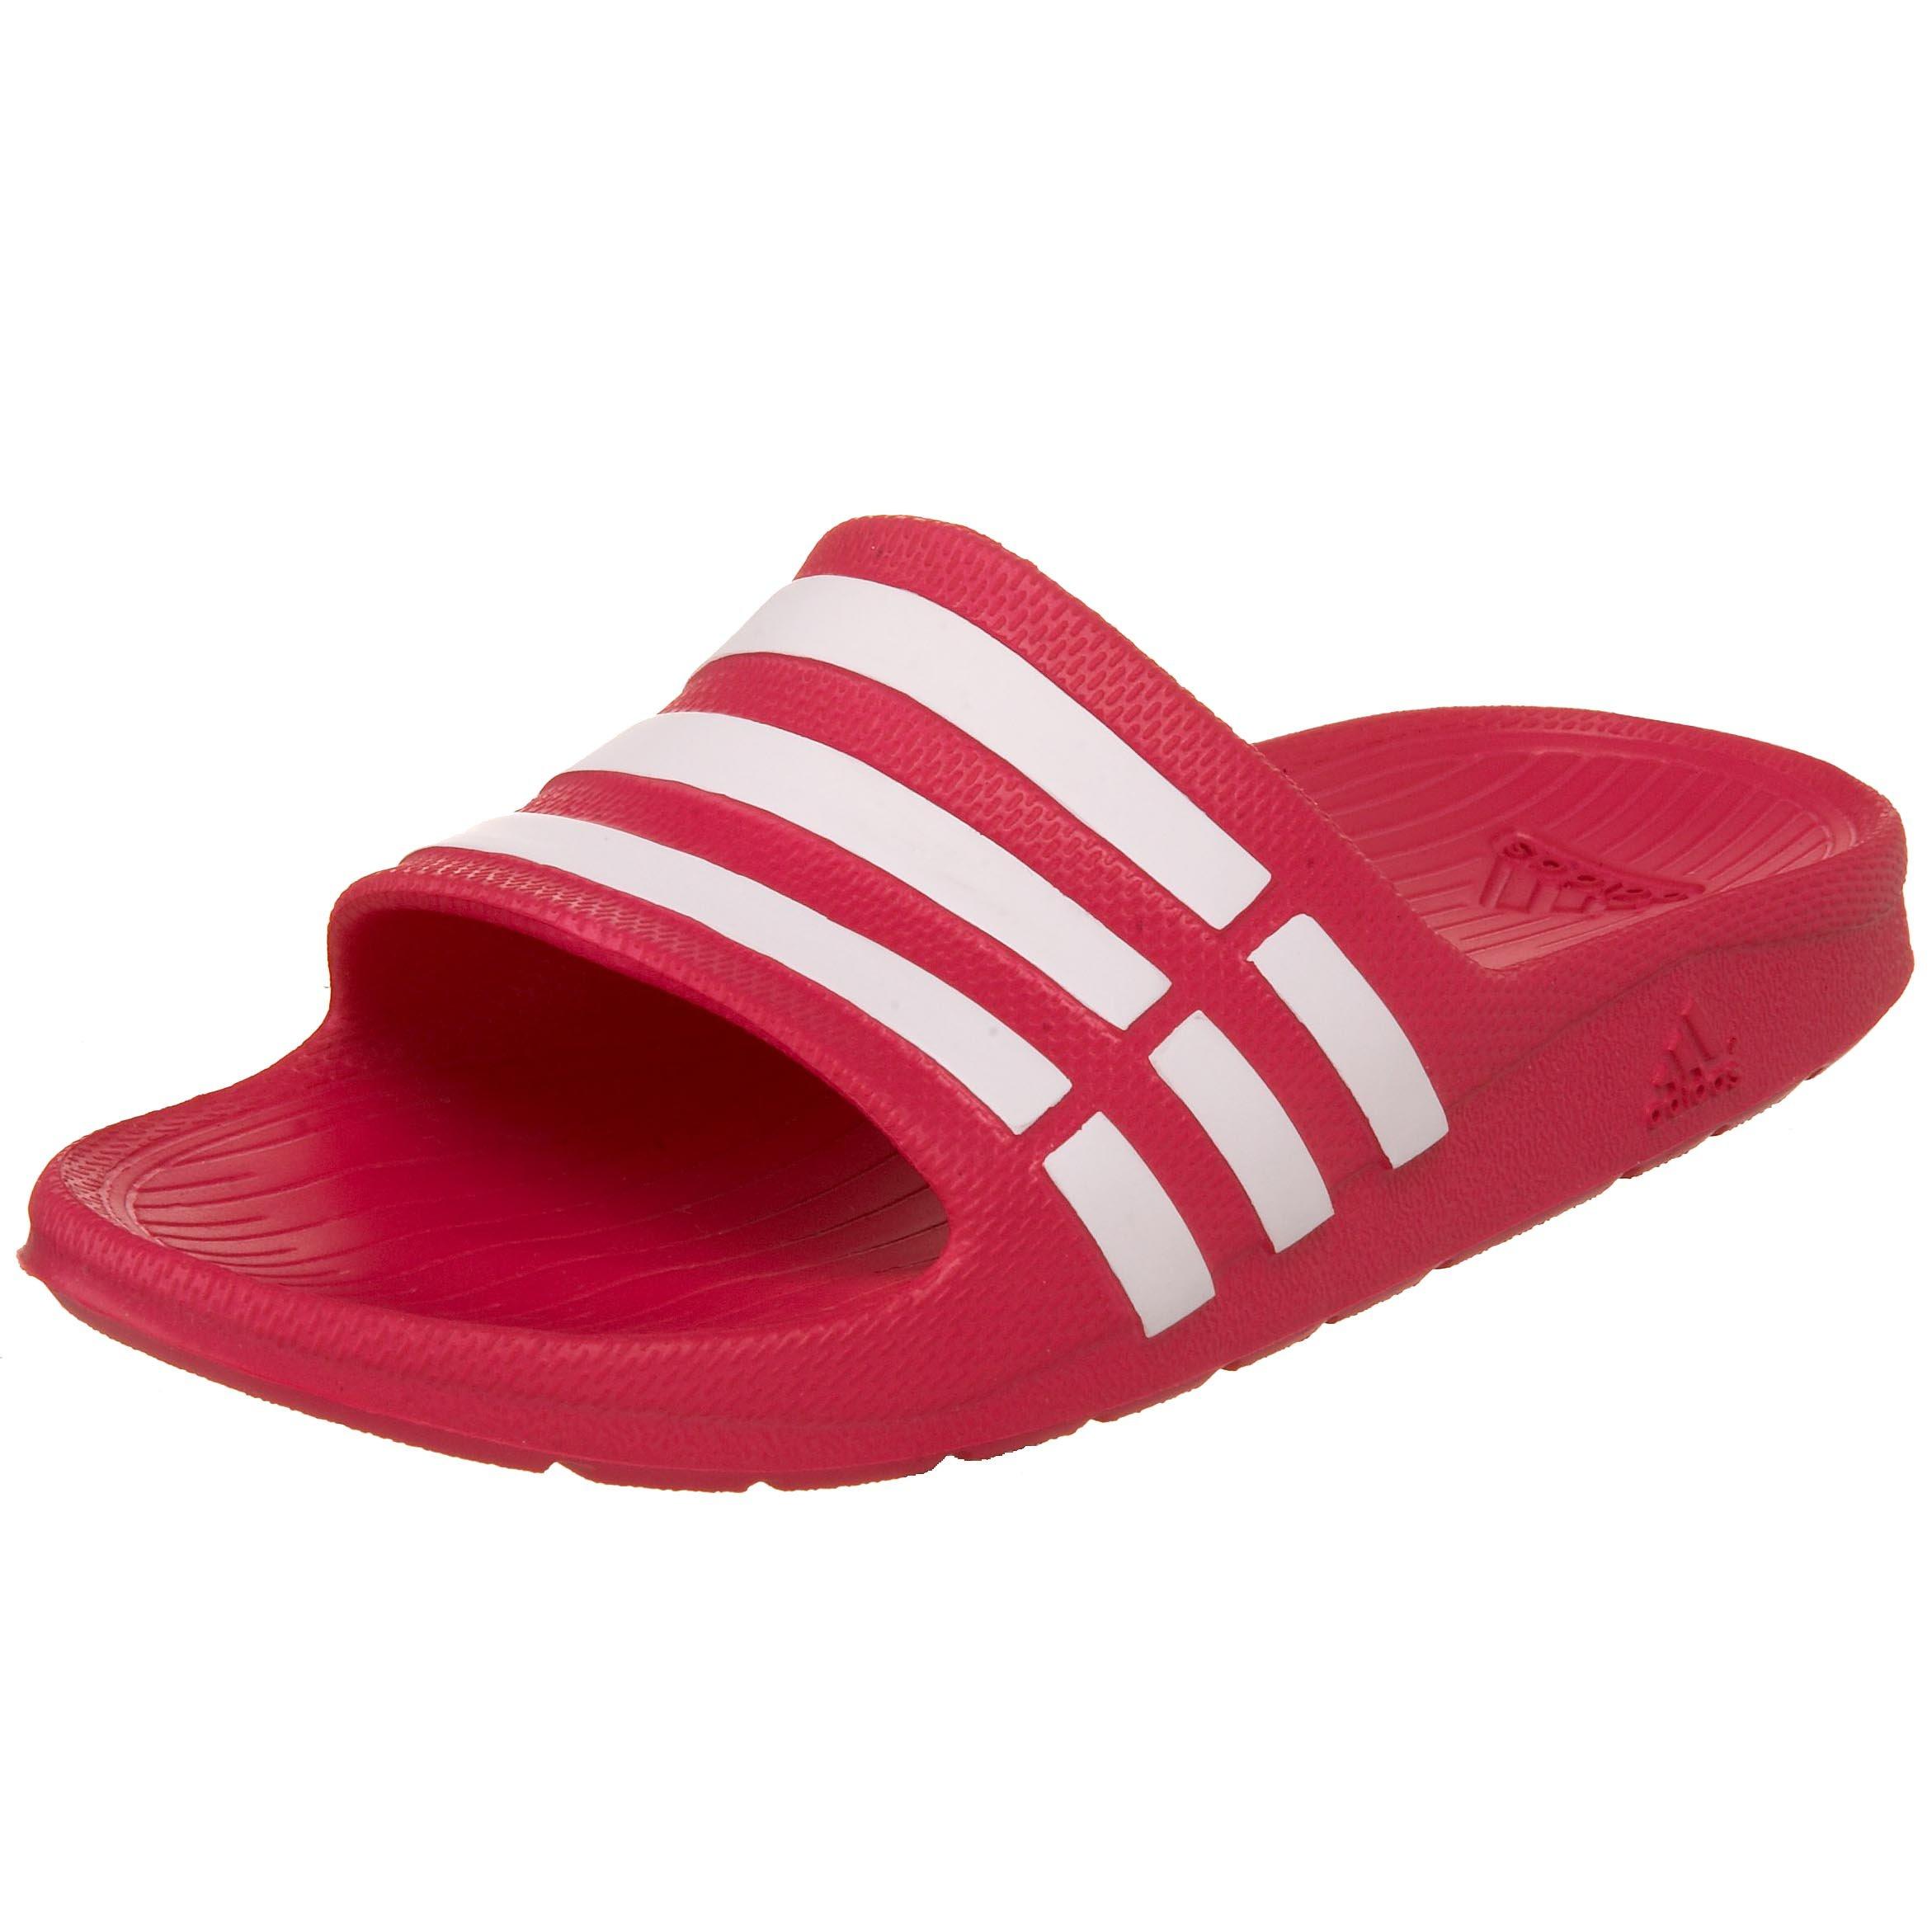 1dca6db703920c Get Quotations · adidas Performance Kids  Duramo Slide Sandal  (Toddler Little Kid Big ...